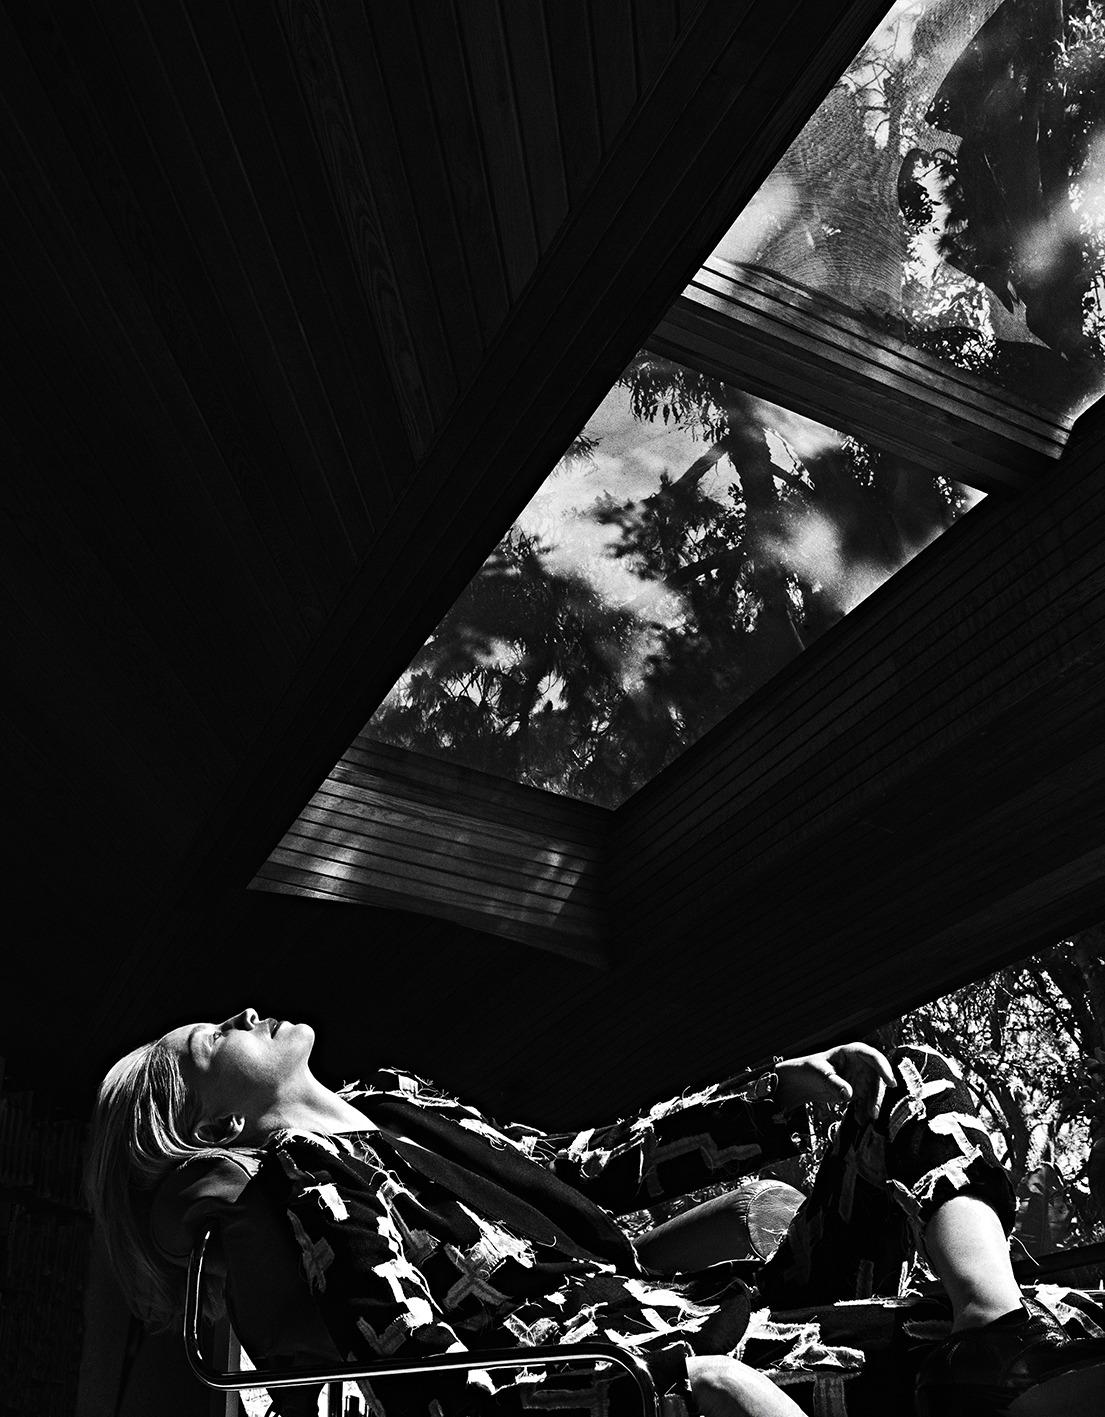 Sharon Stone by Branislav Simoncik for Vogue Portugal May 2019 (8).jpg